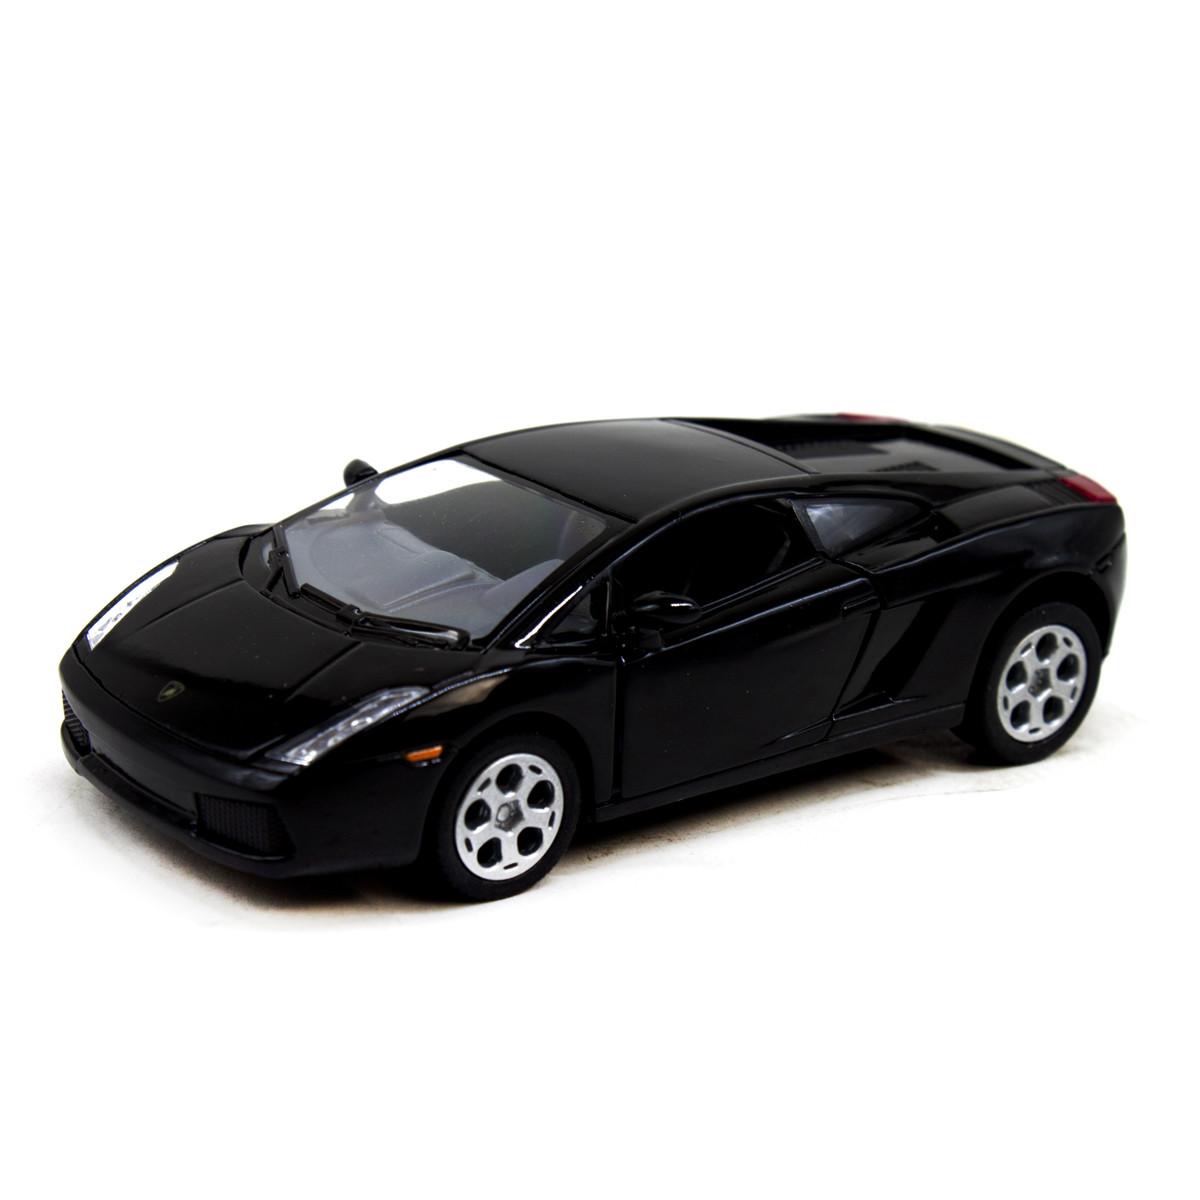 Машинка KINSMART Lamborghini Gallardo черный